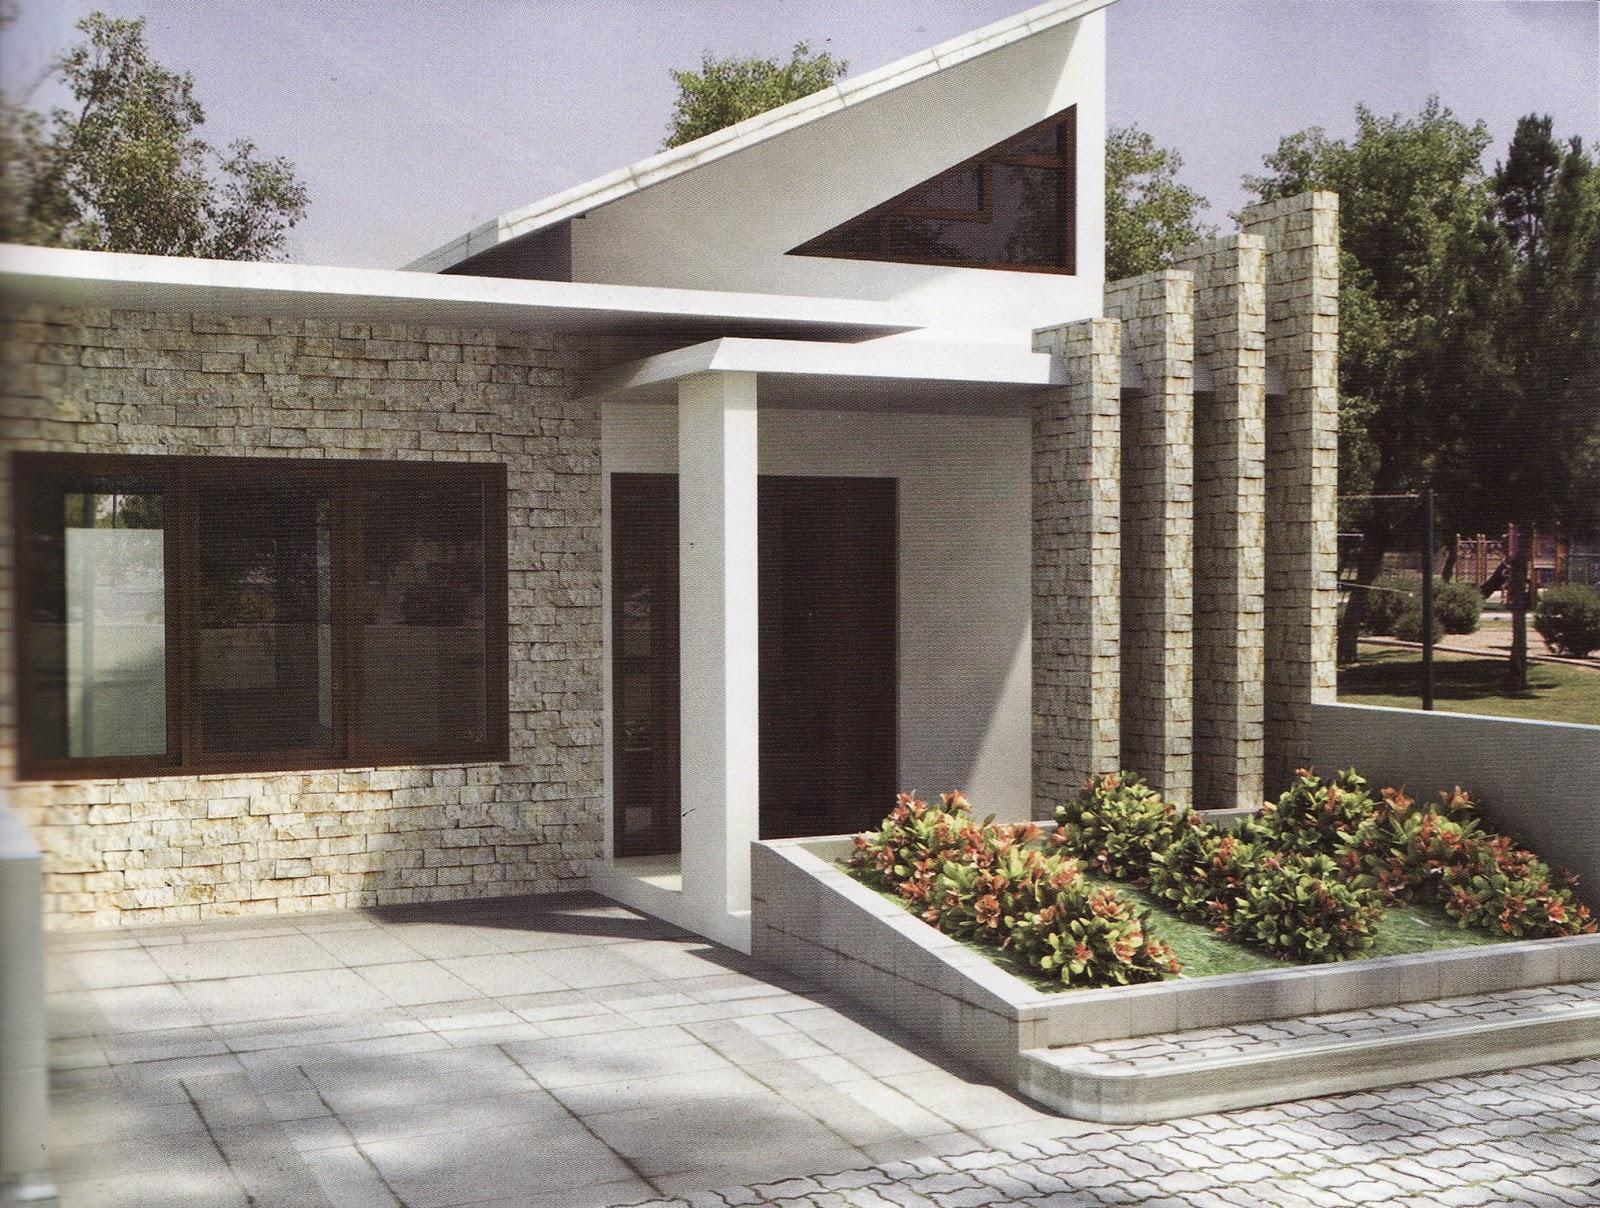 10 Model Rumah Idaman Minimalis Terbaru Paling Keren